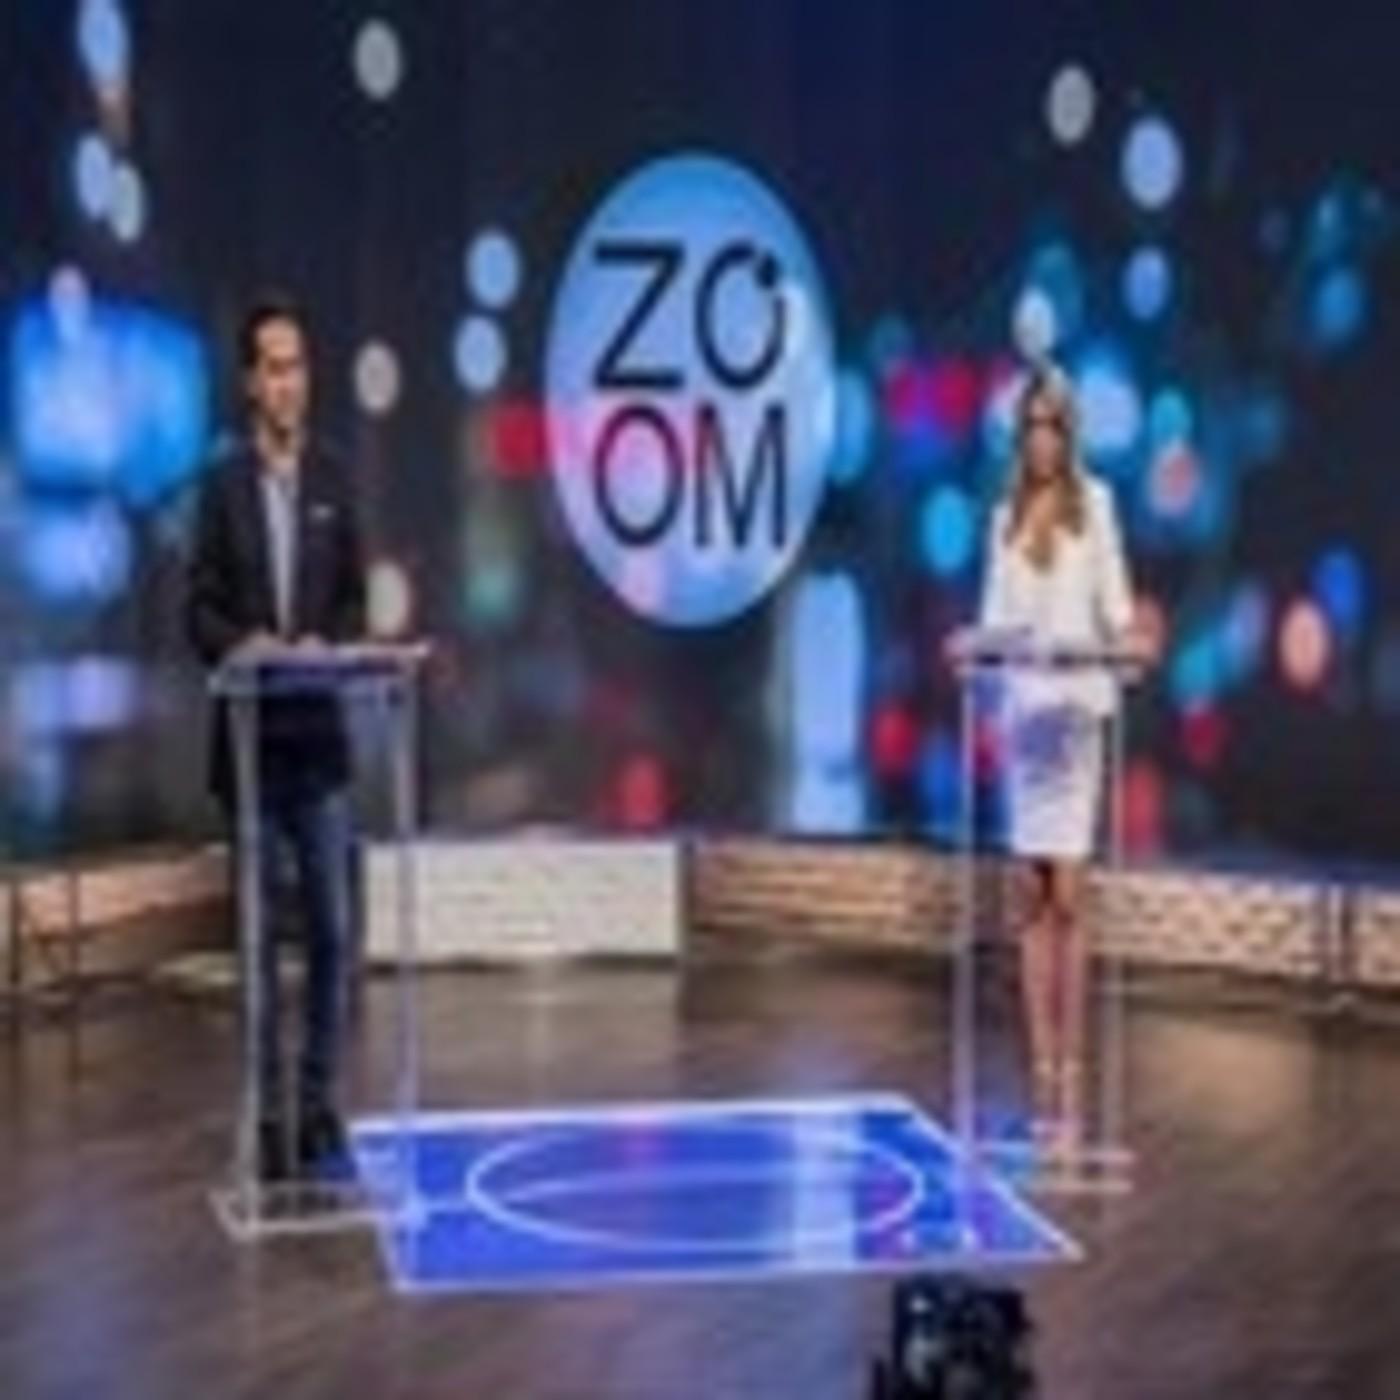 Cuarto milenio zoom 1x04 25 09 2016 desapariciones for Cuarto milenio 2016